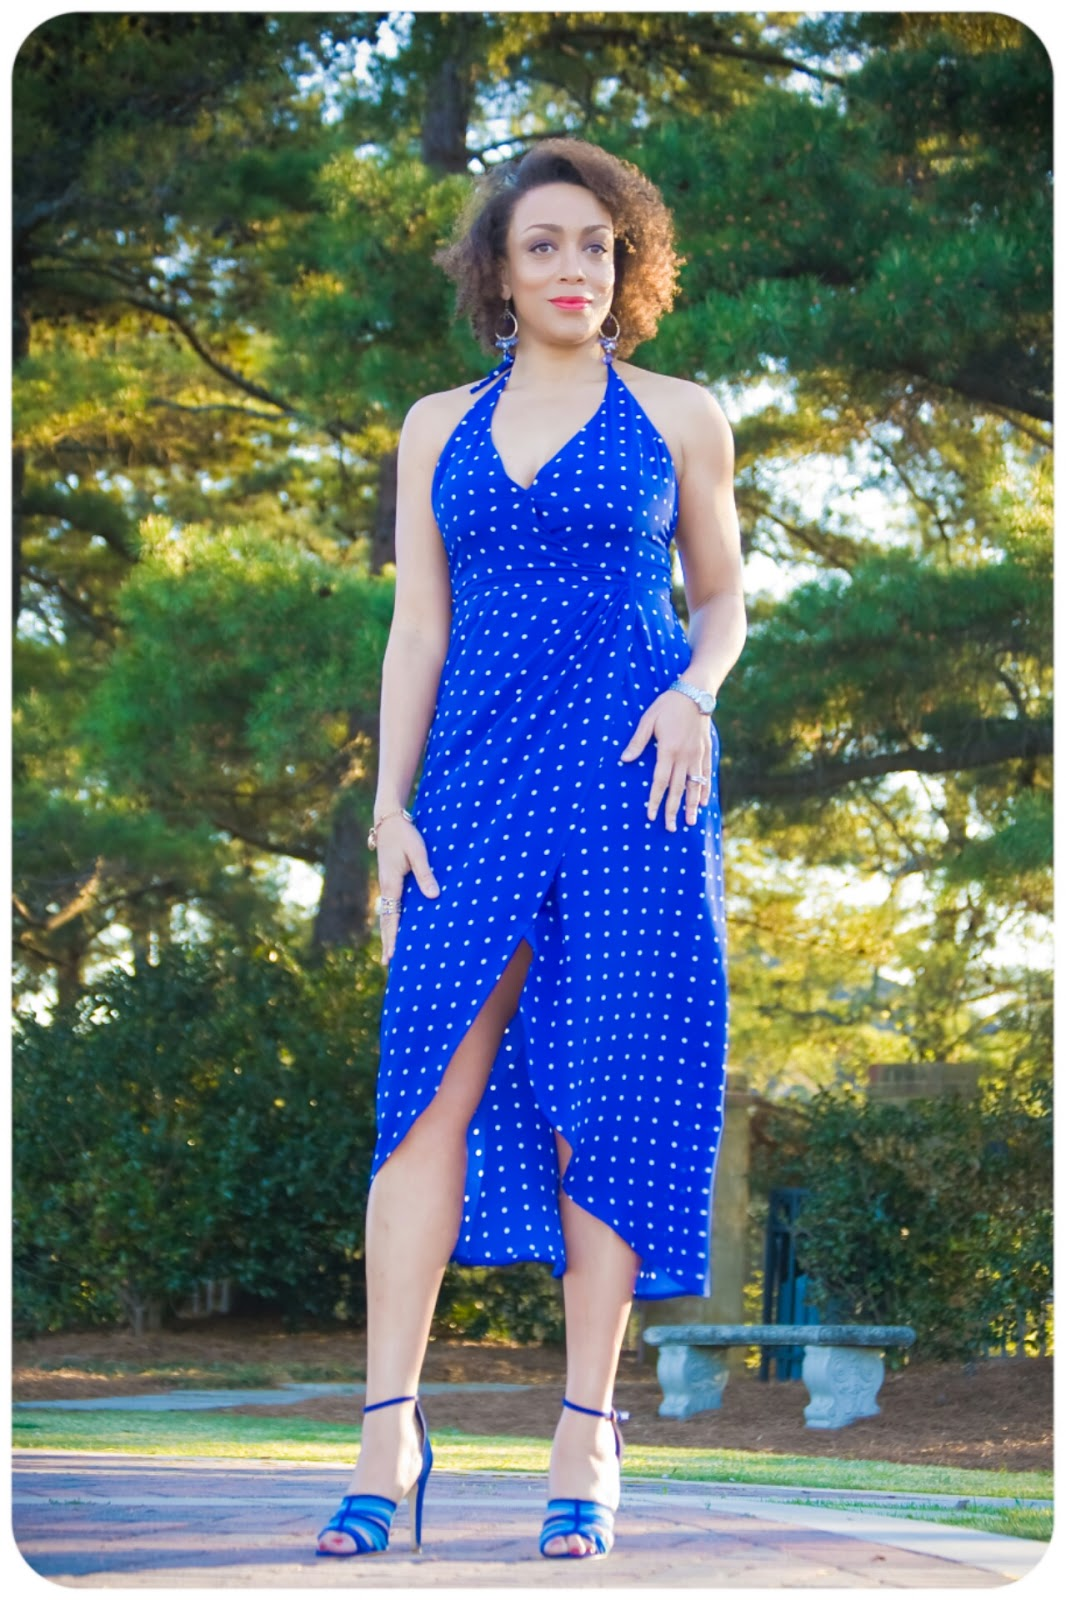 Erica B's DIY Style: Vtg Simplicity 9704 Halter Wrap Dress made in Ralph Lauren Polka Dot Silk Crepe from Mood Fabrics.com